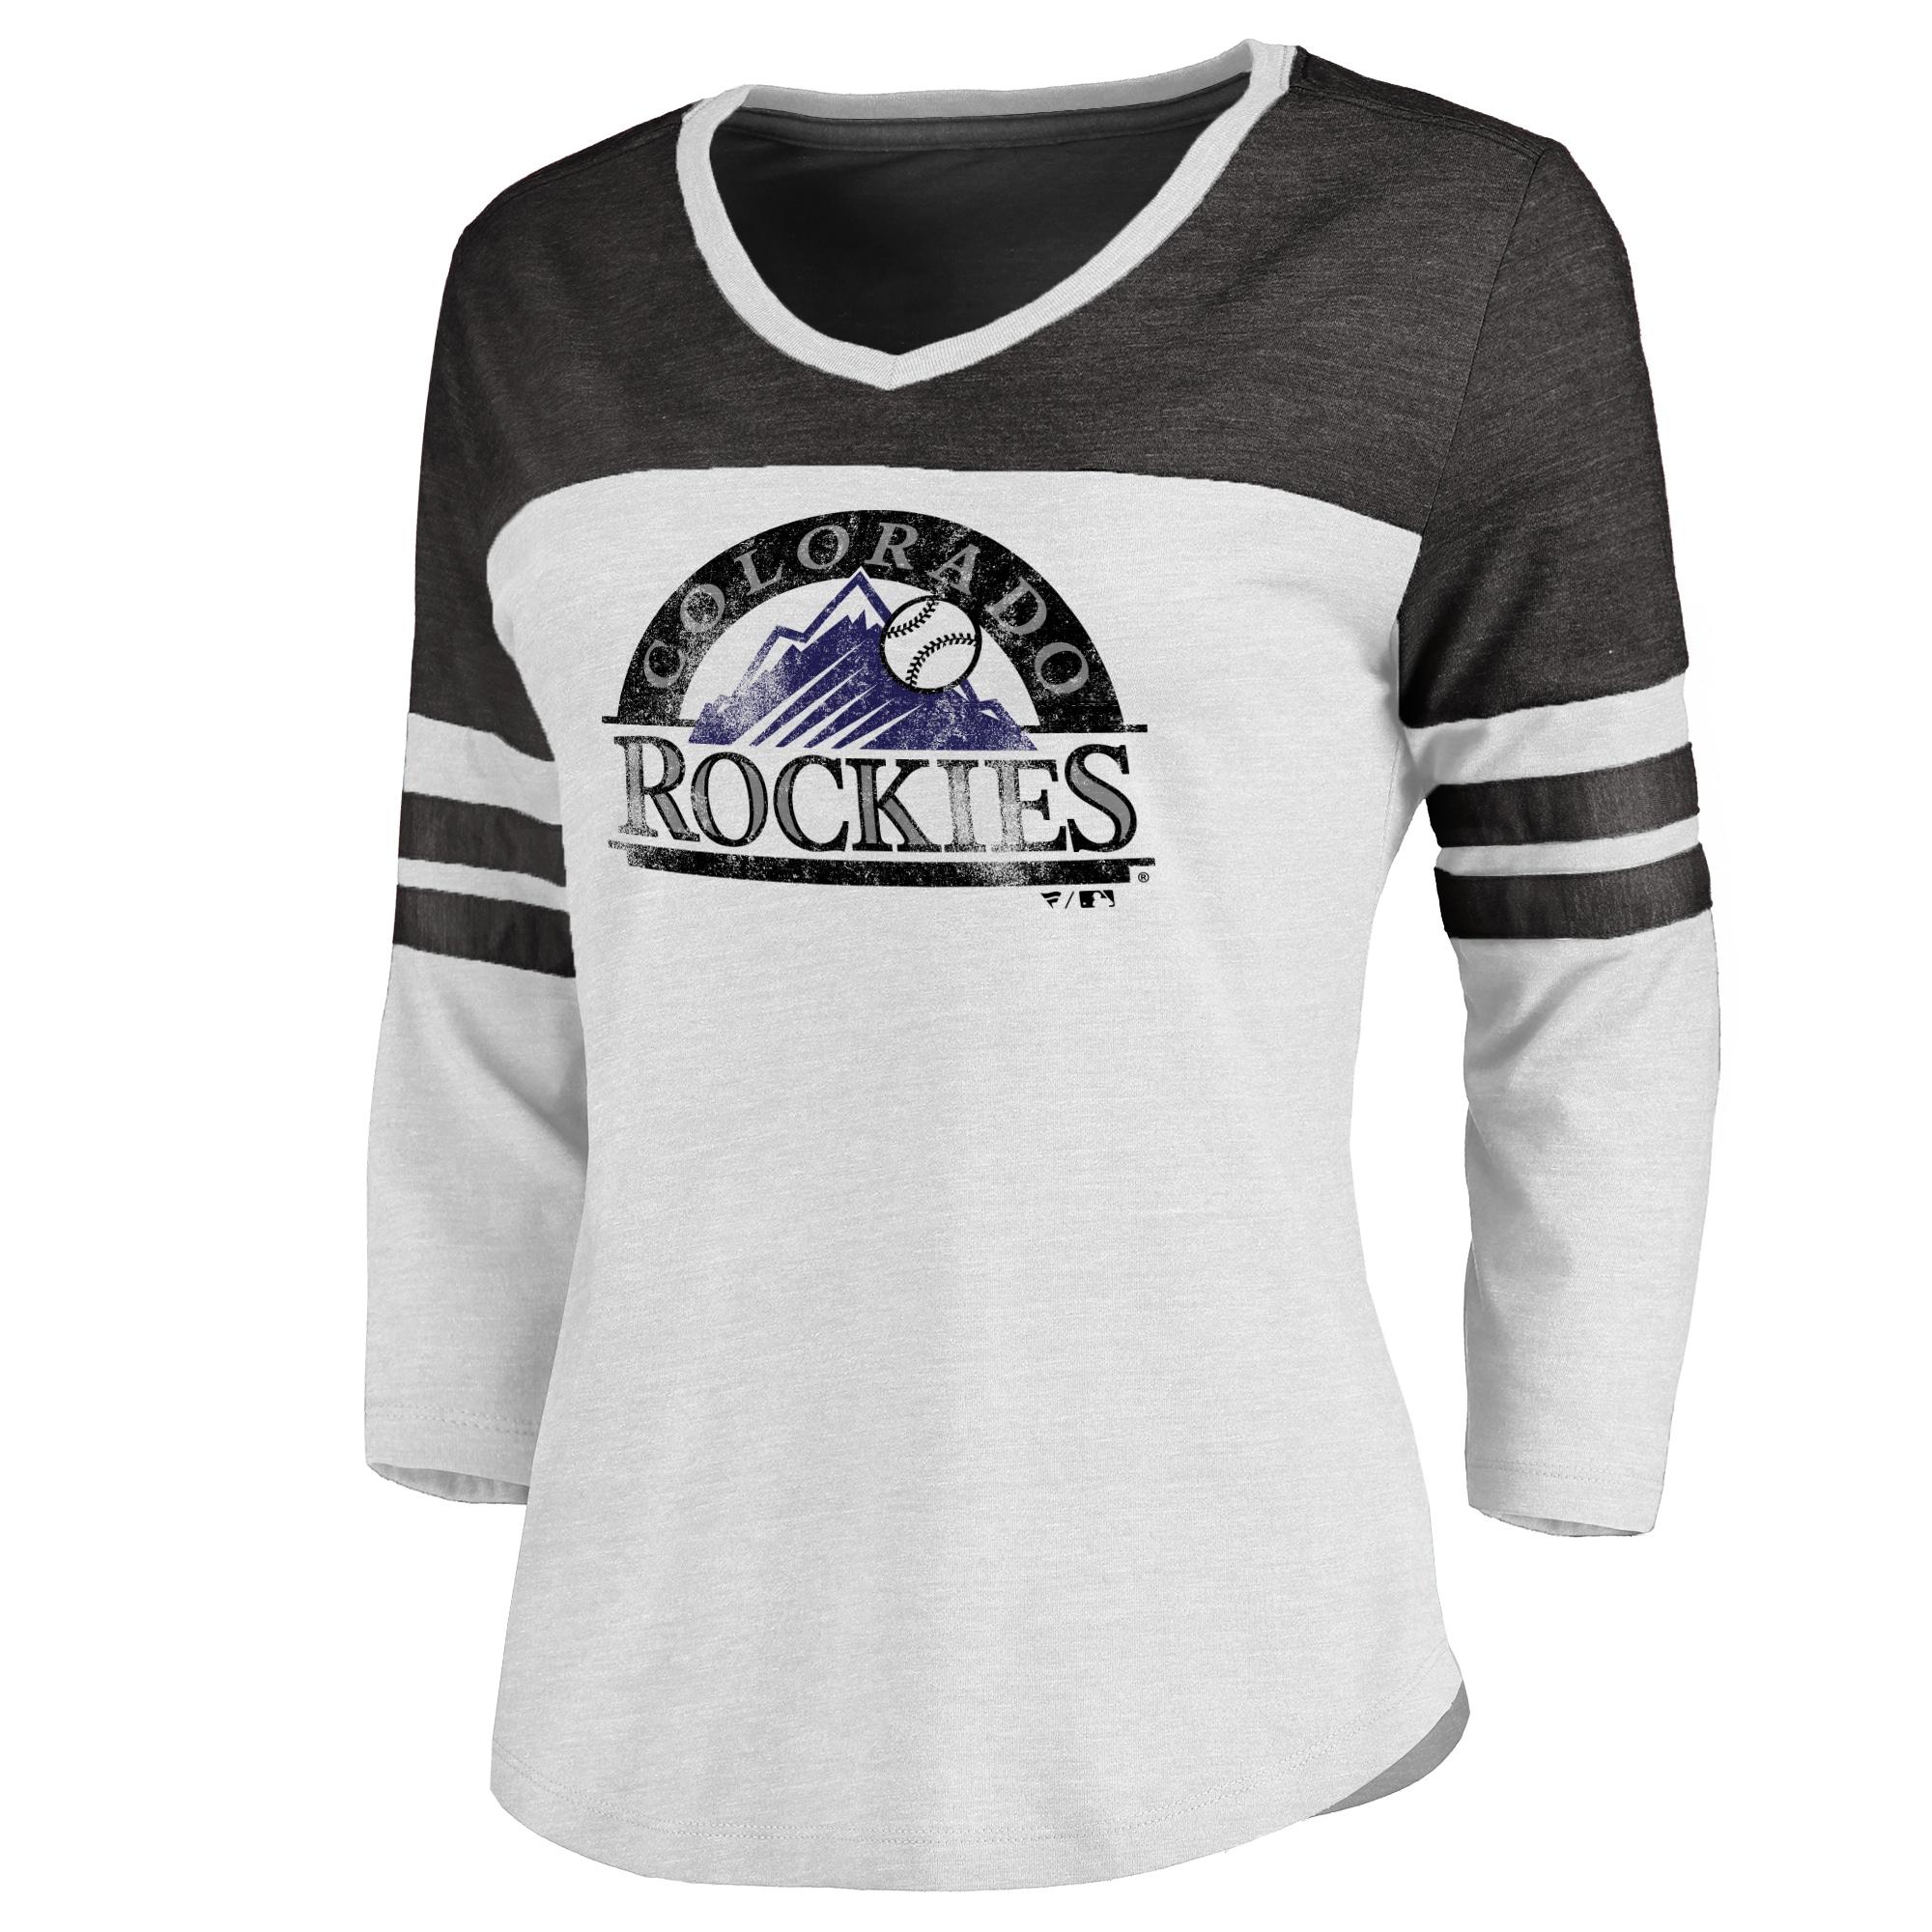 Colorado Rockies Women's Cooperstown Two-Tone Three-Quarter Sleeve Tri-Blend T-Shirt - White/Black